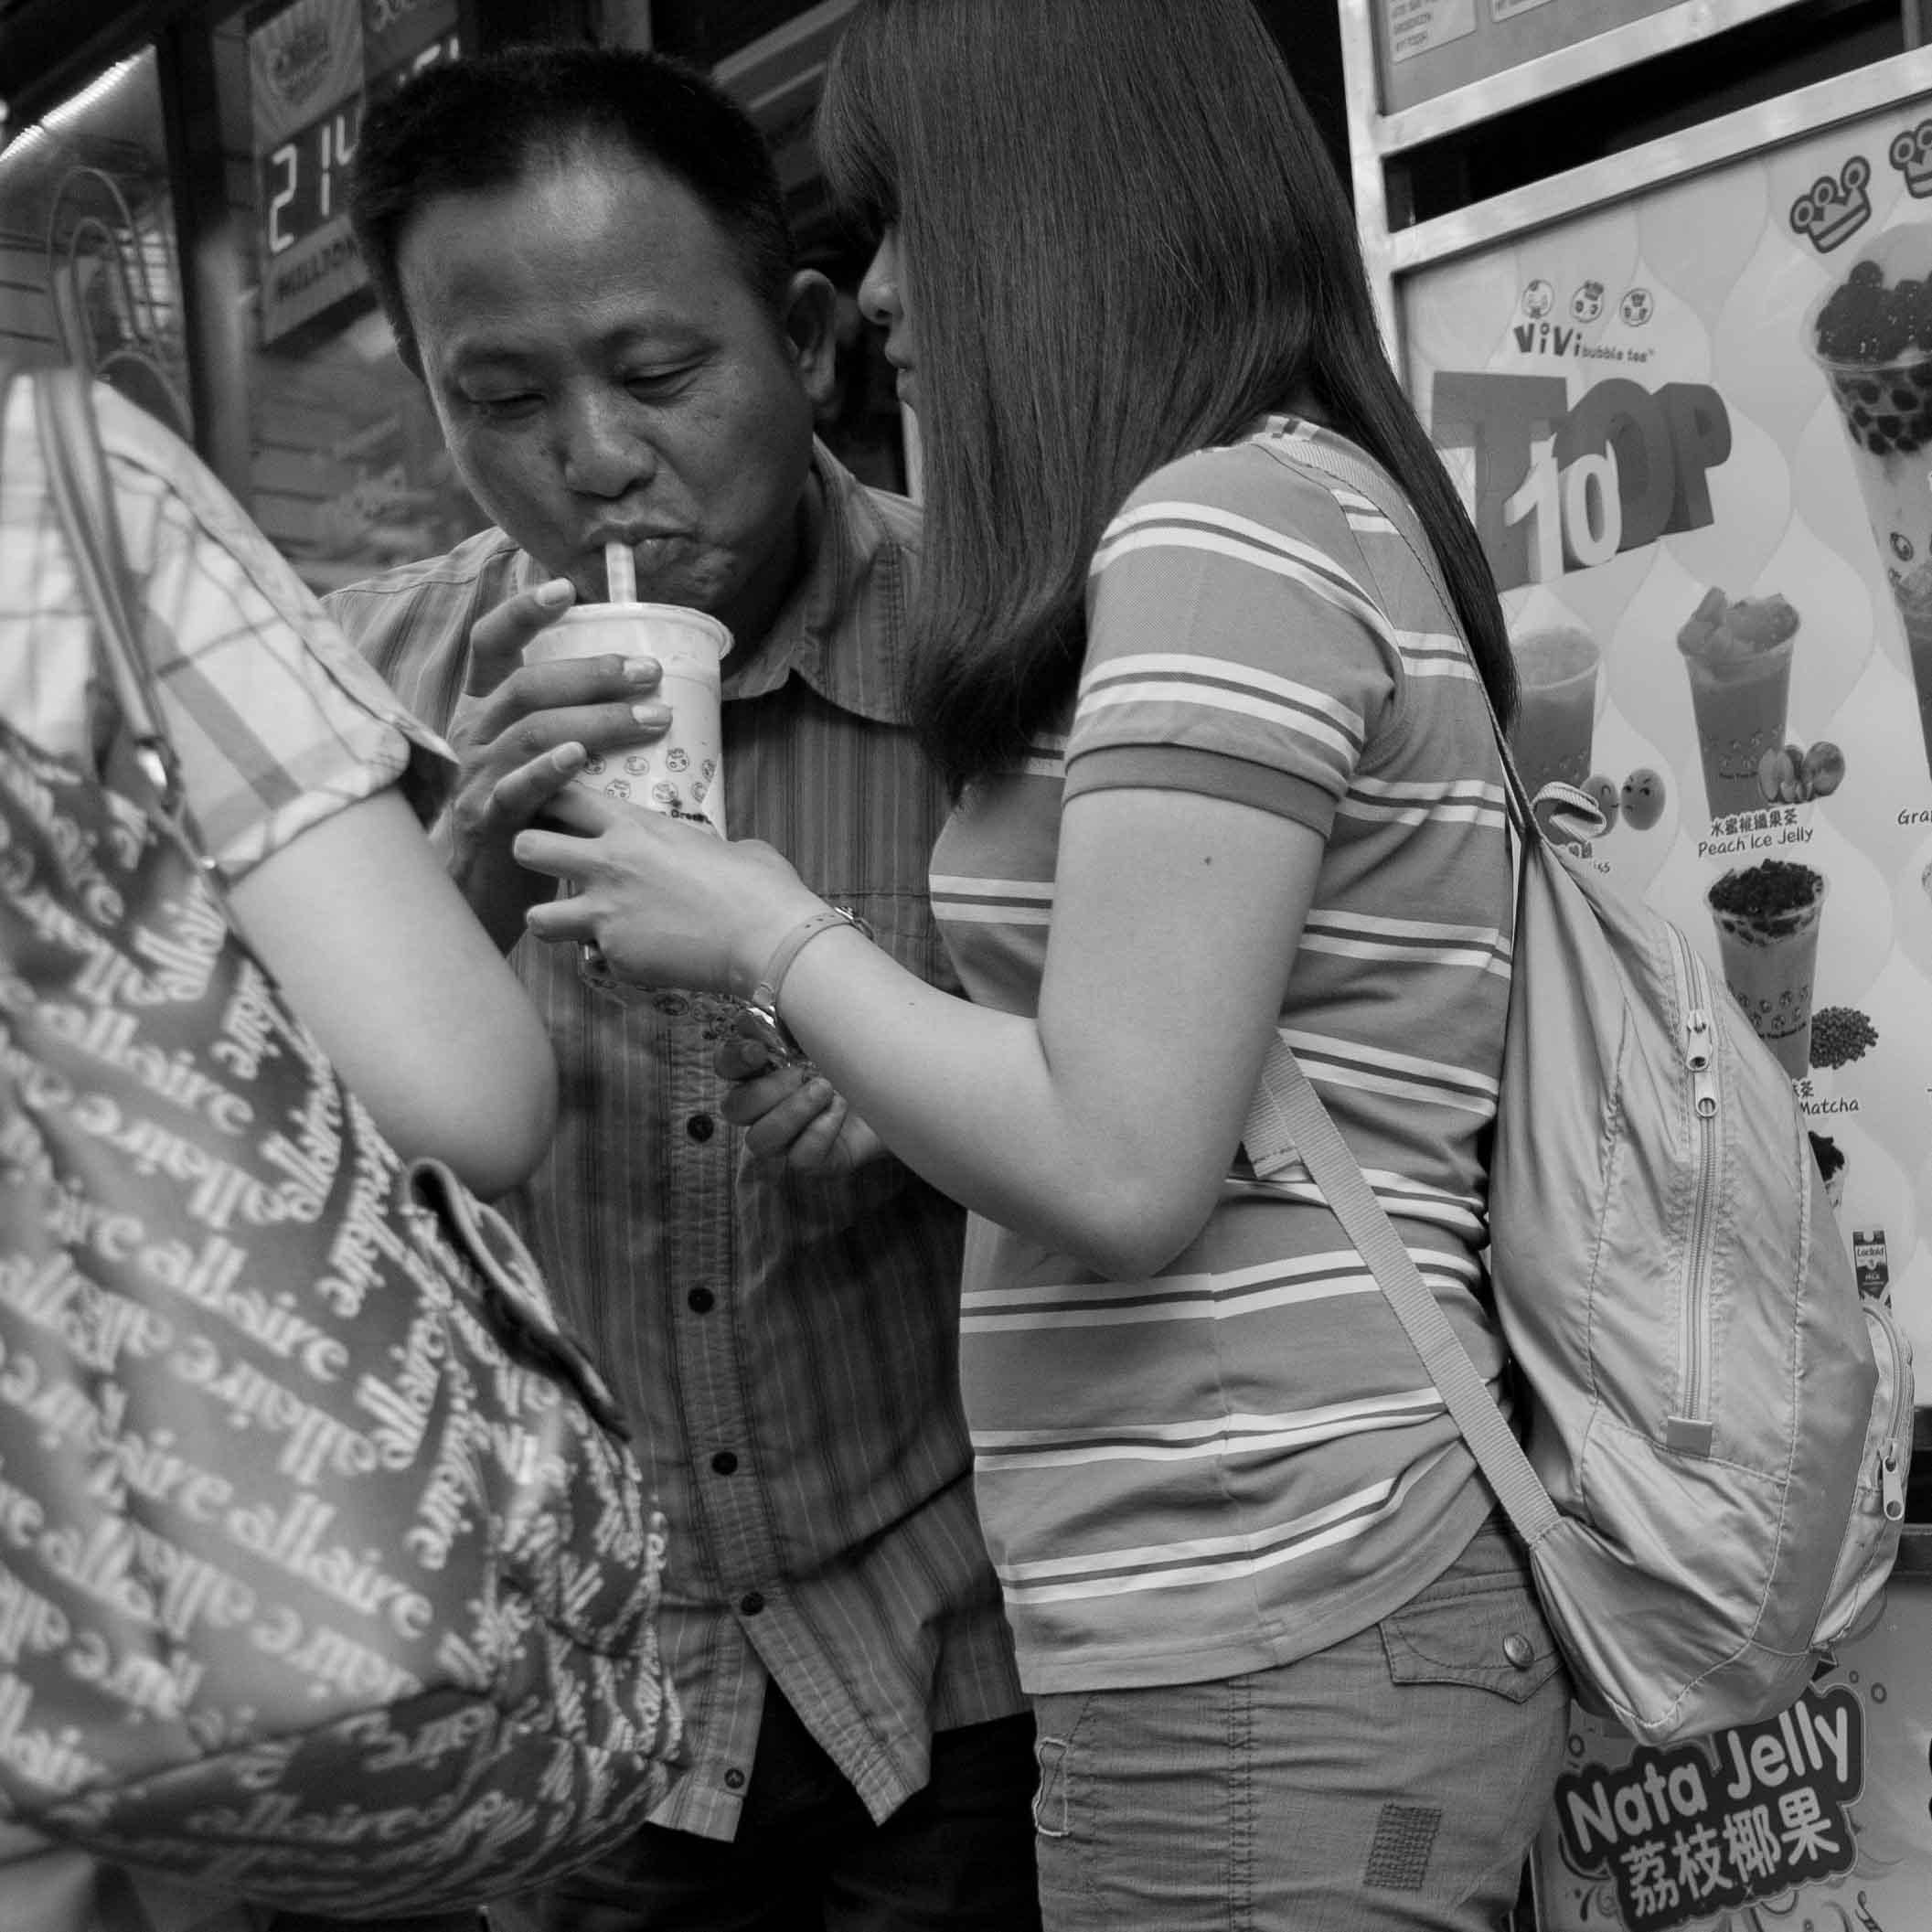 Streetphotography 3.0-115.jpg